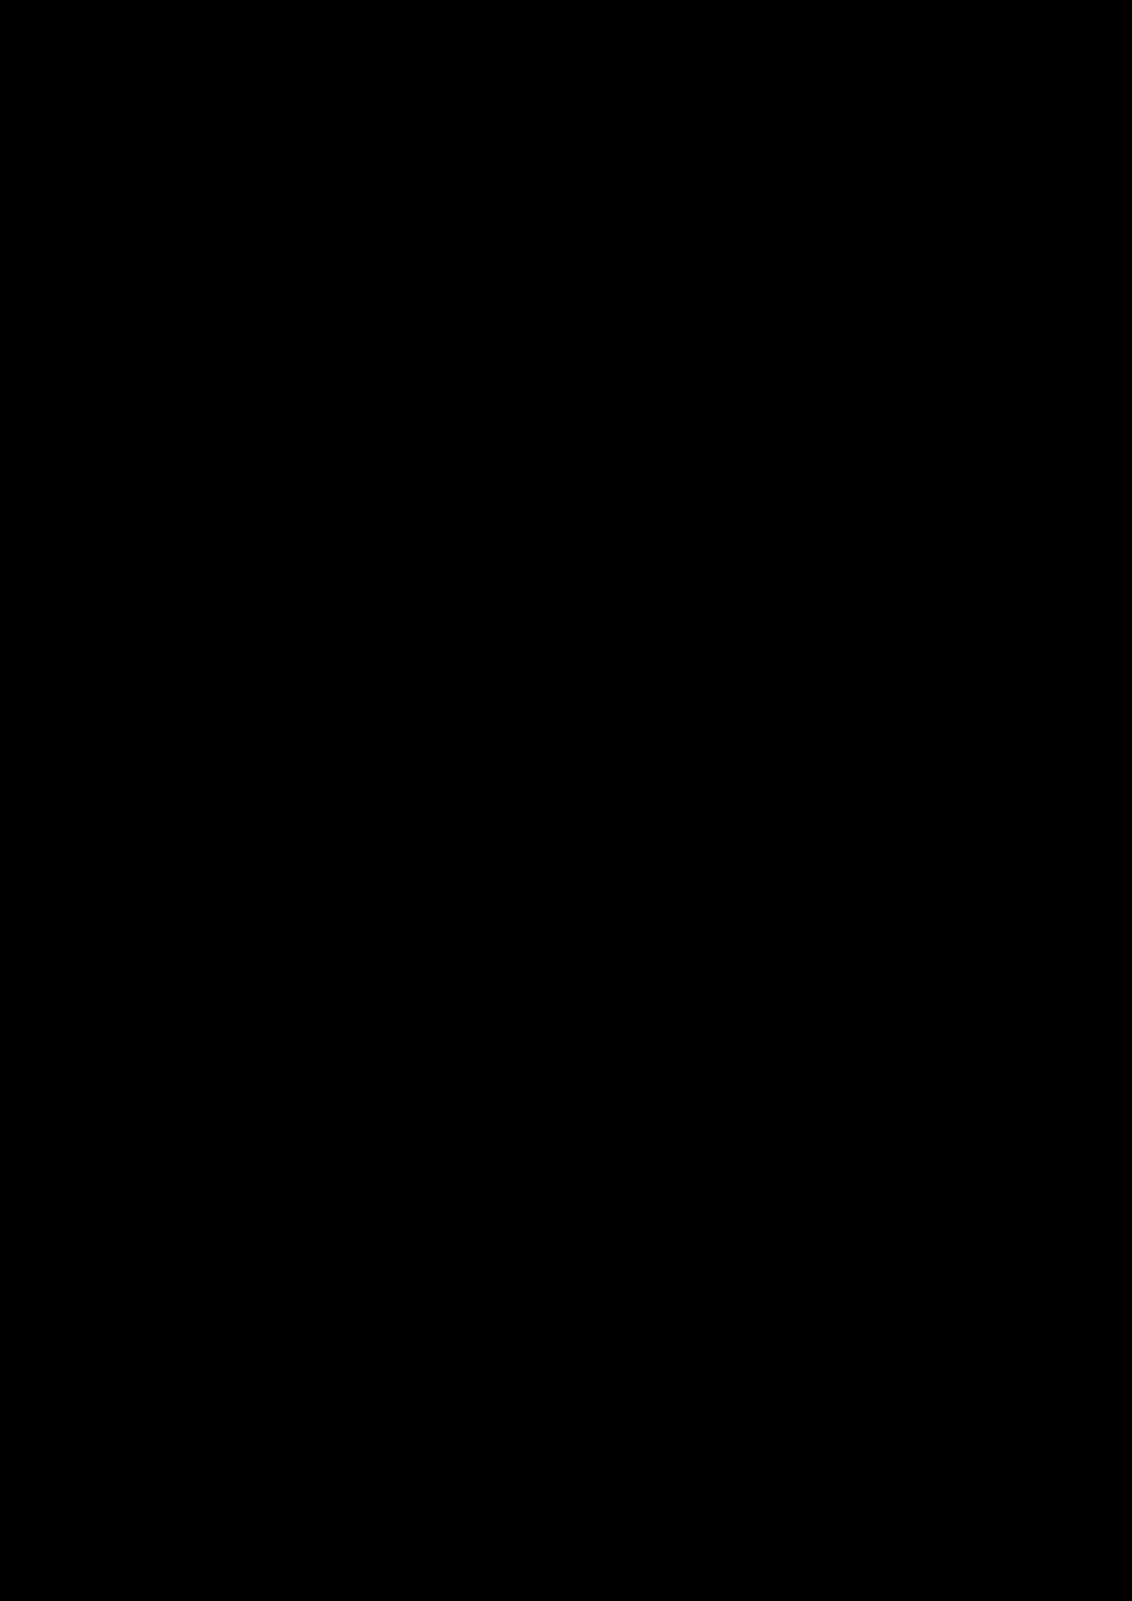 Belyiy sokol slide, Image 113